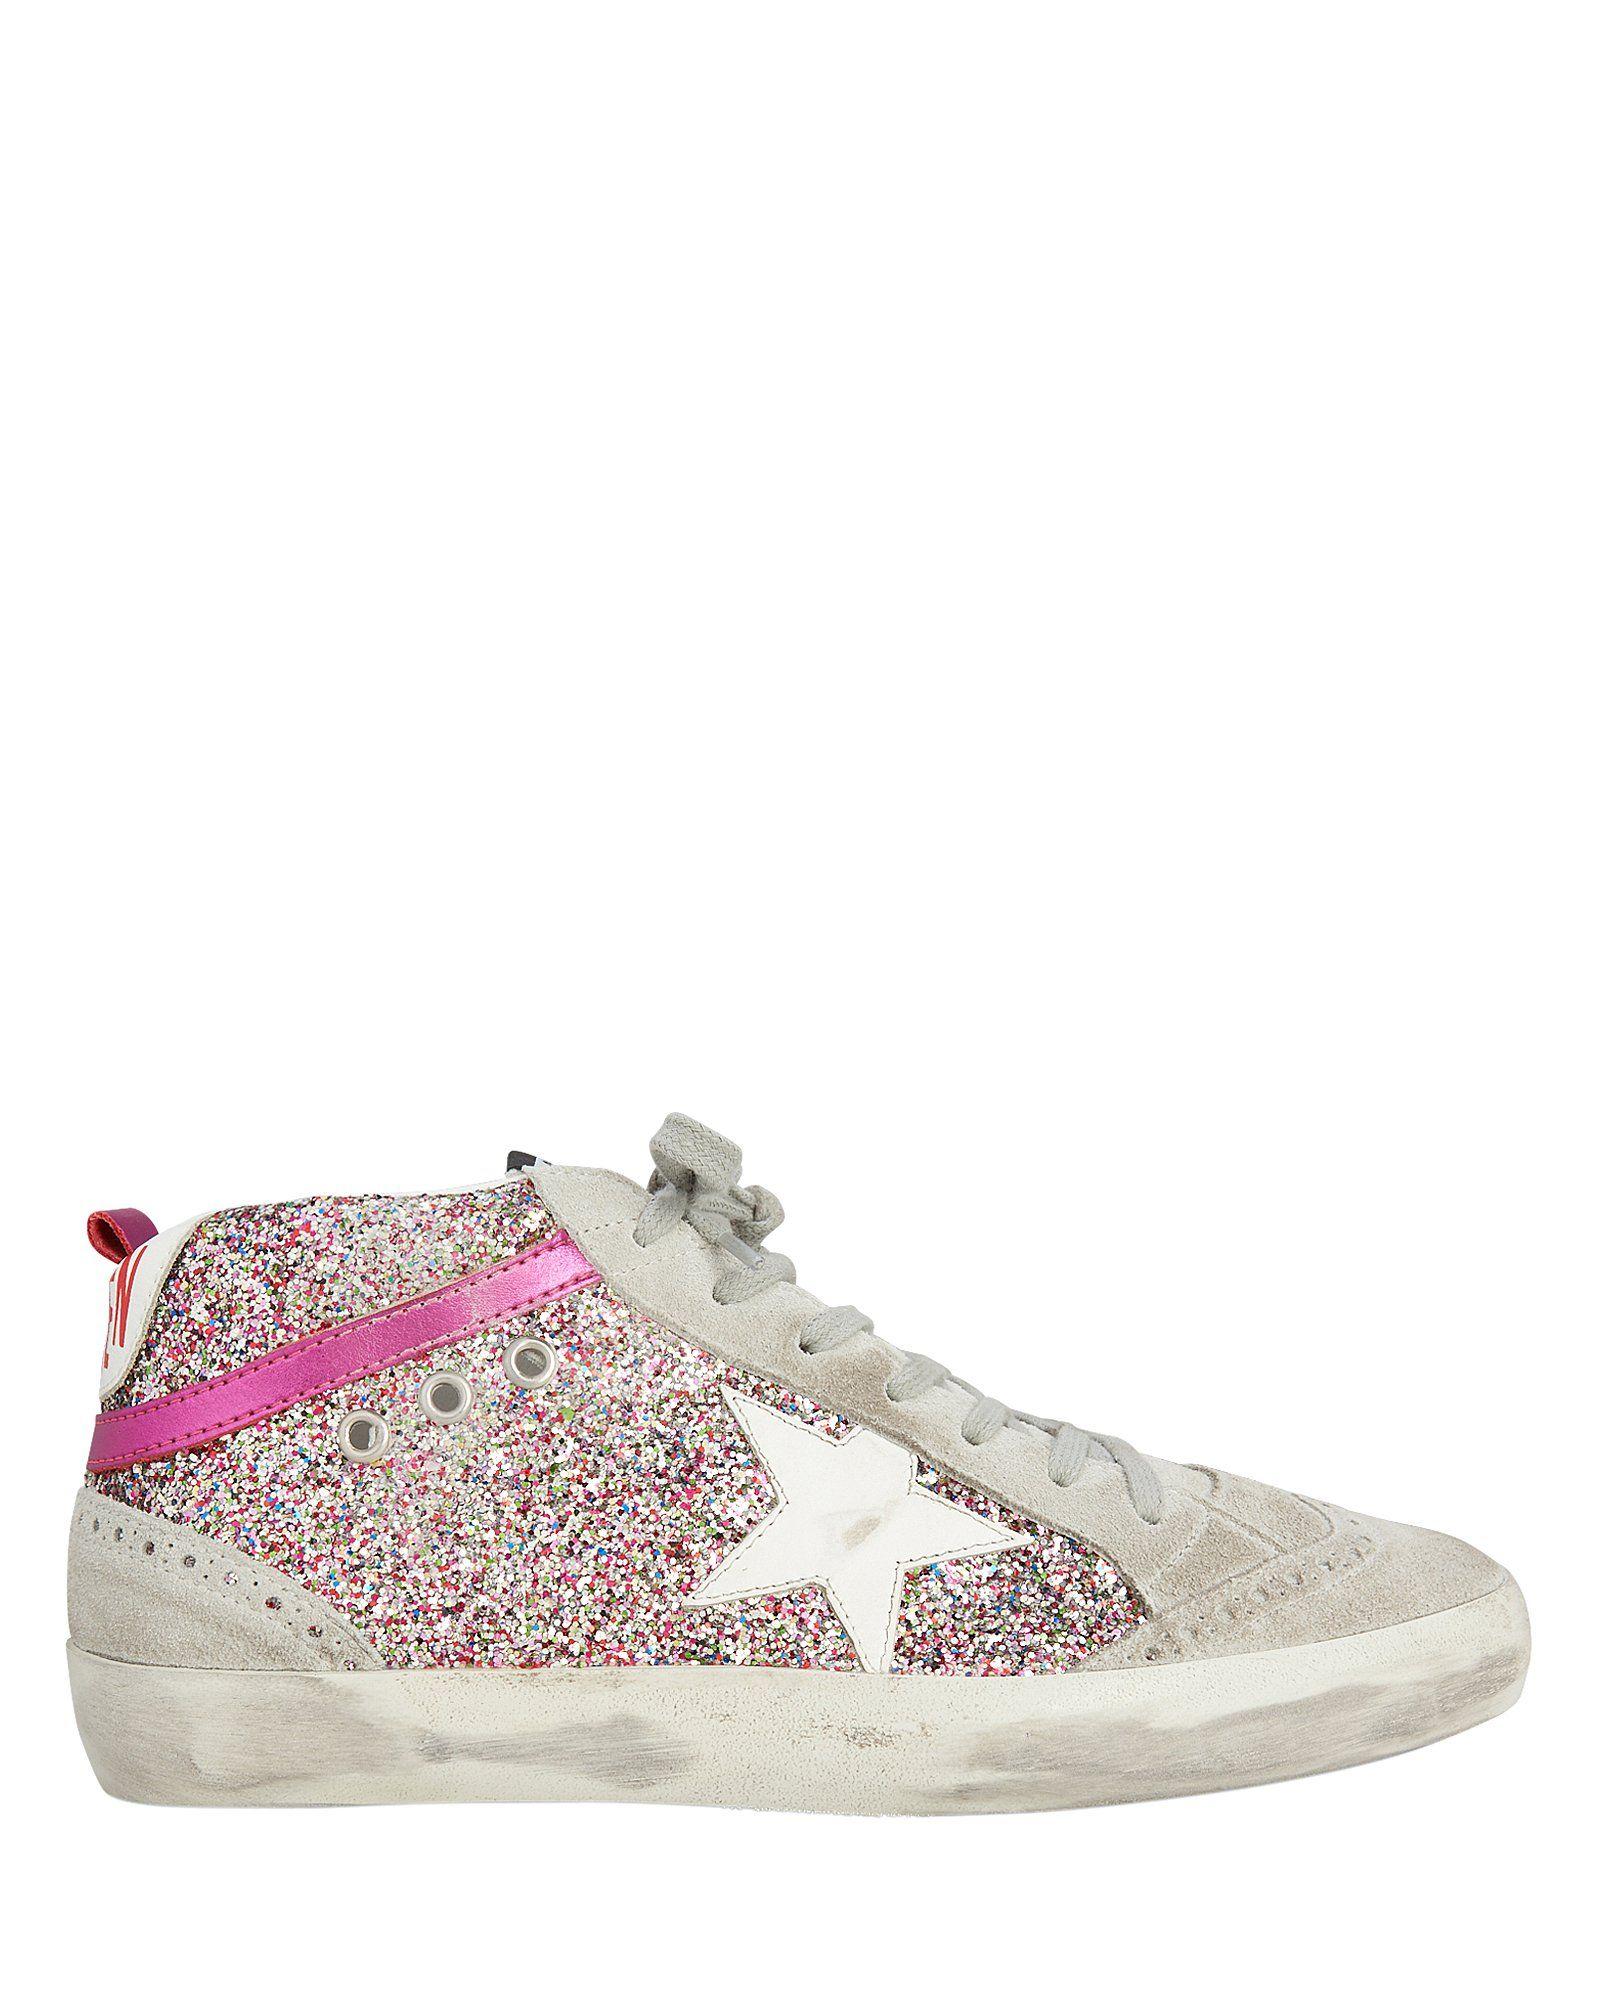 Mid Star Rainbow Glitter Sneakers in